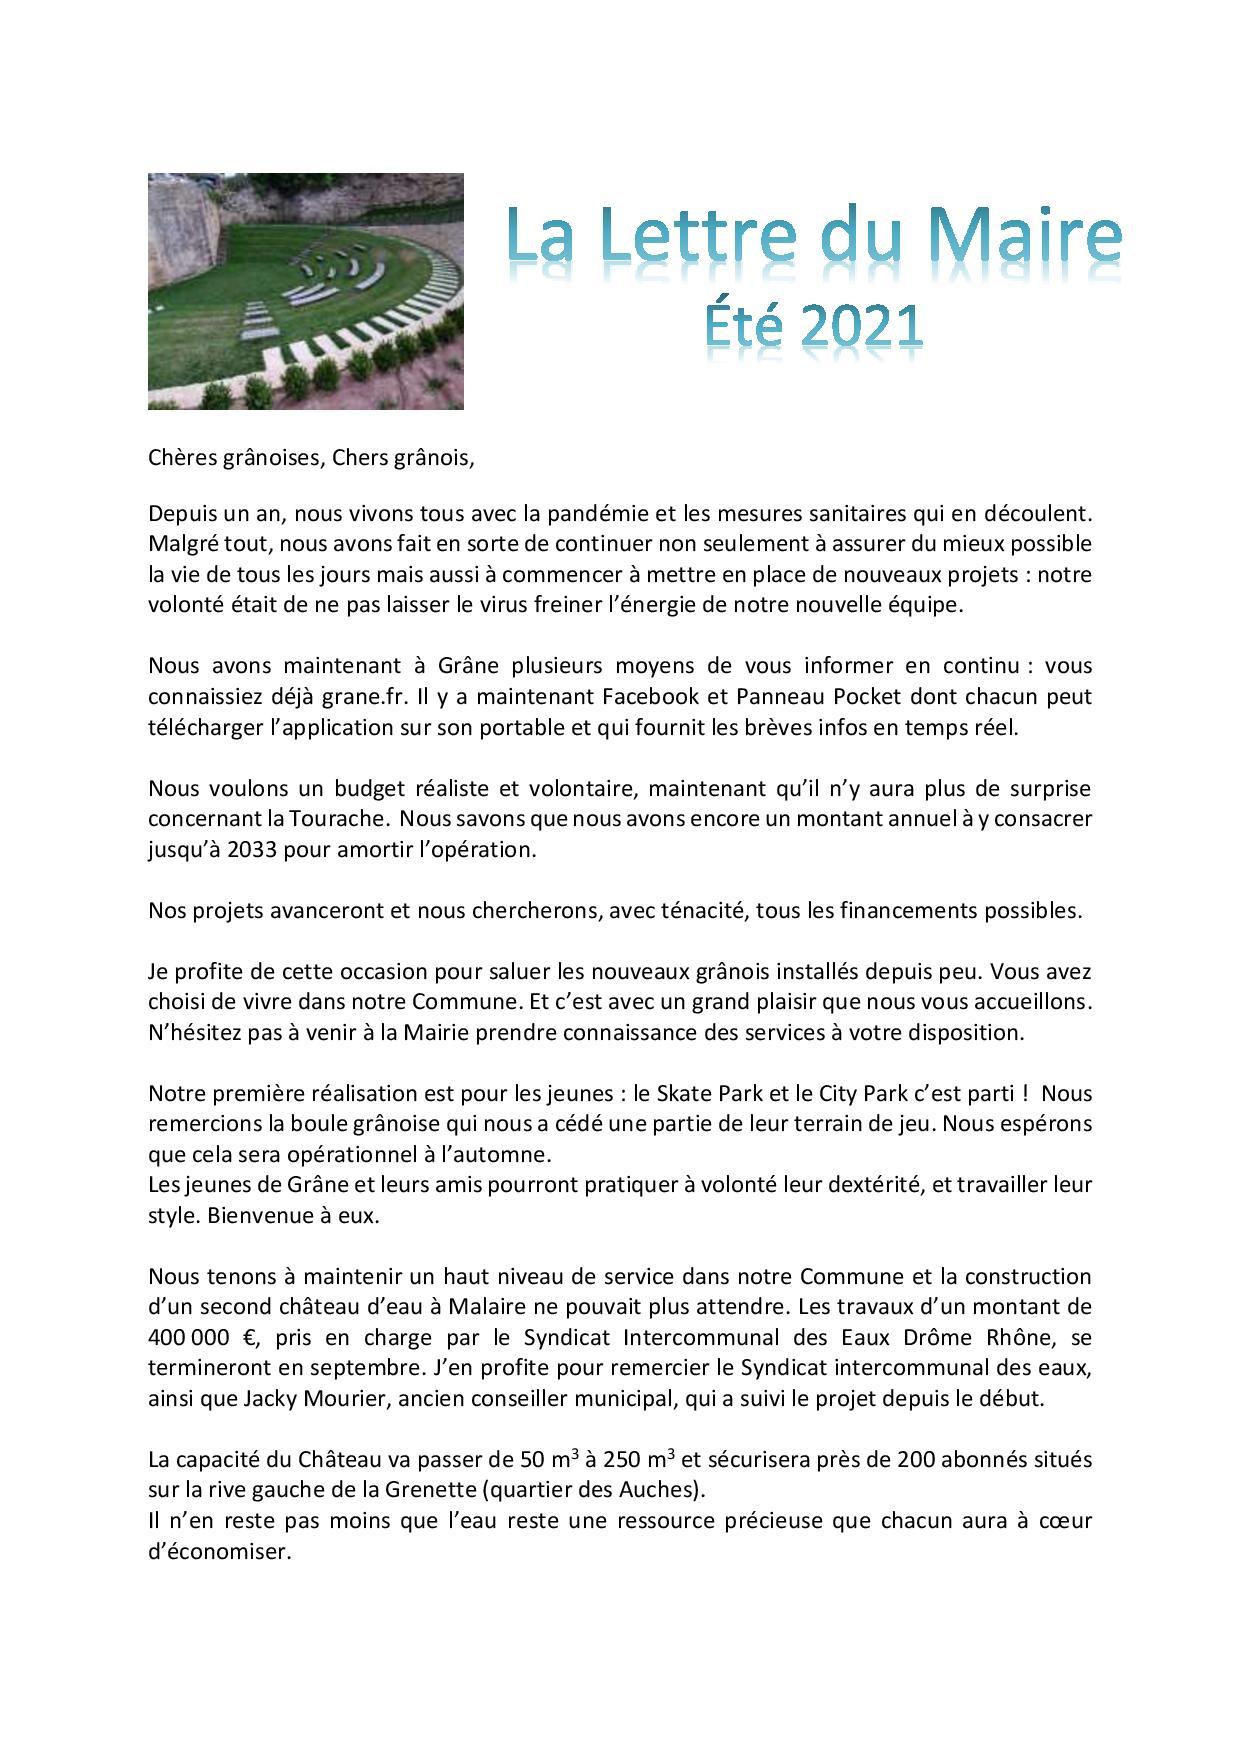 Lettre du Maire juillet 2021_2_-page-001.jpg